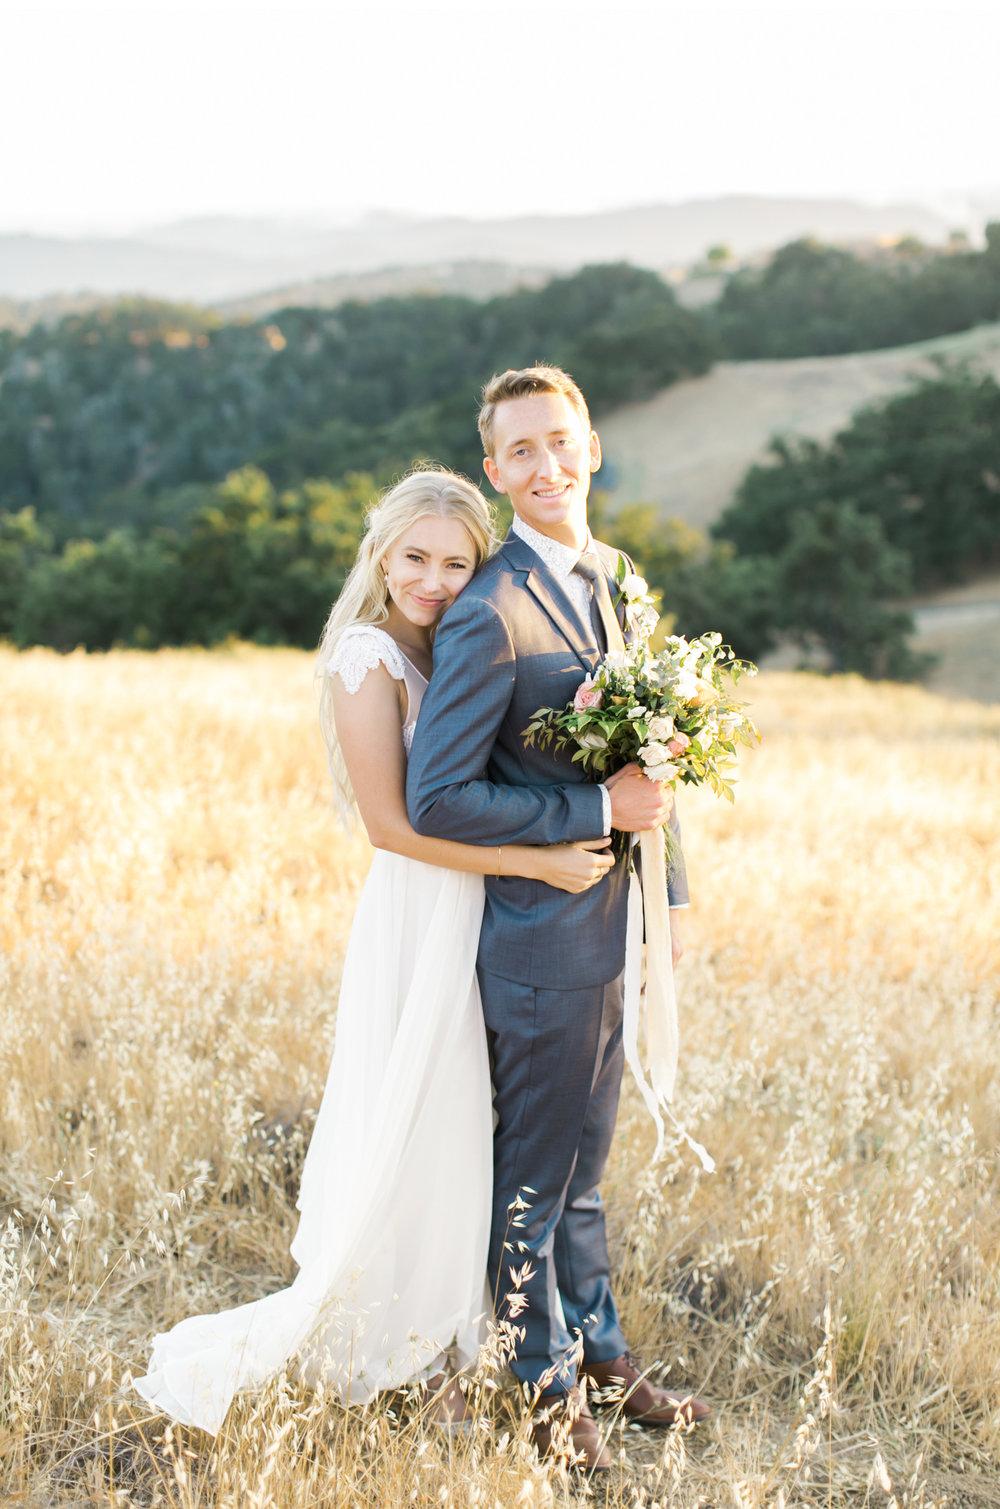 Style-Me-Pretty-California-Wedding-San-Luis-Obispo-Paso-Robles-Natalie-Schutt-Photography_17.jpg